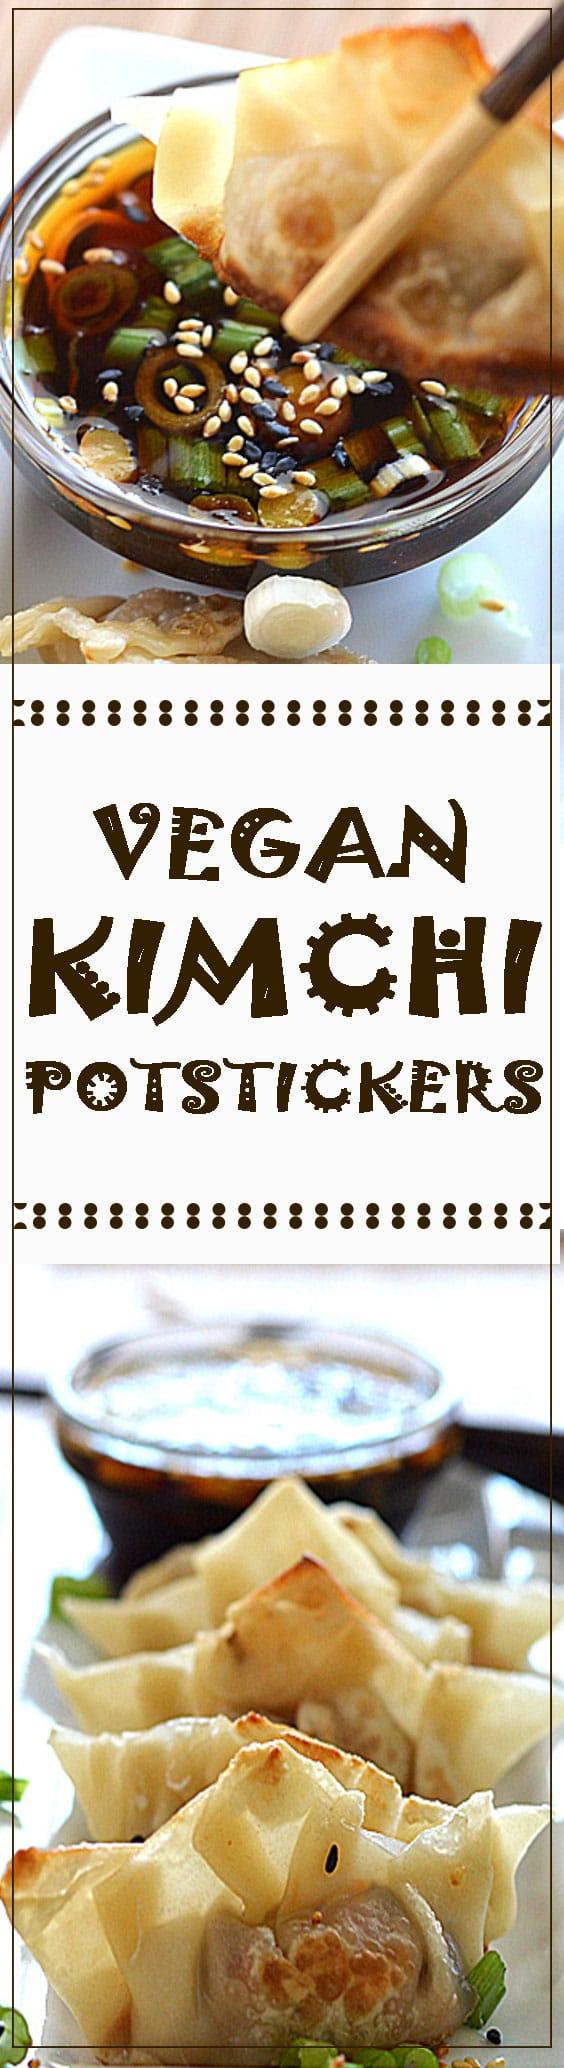 Kimchi Potstickers